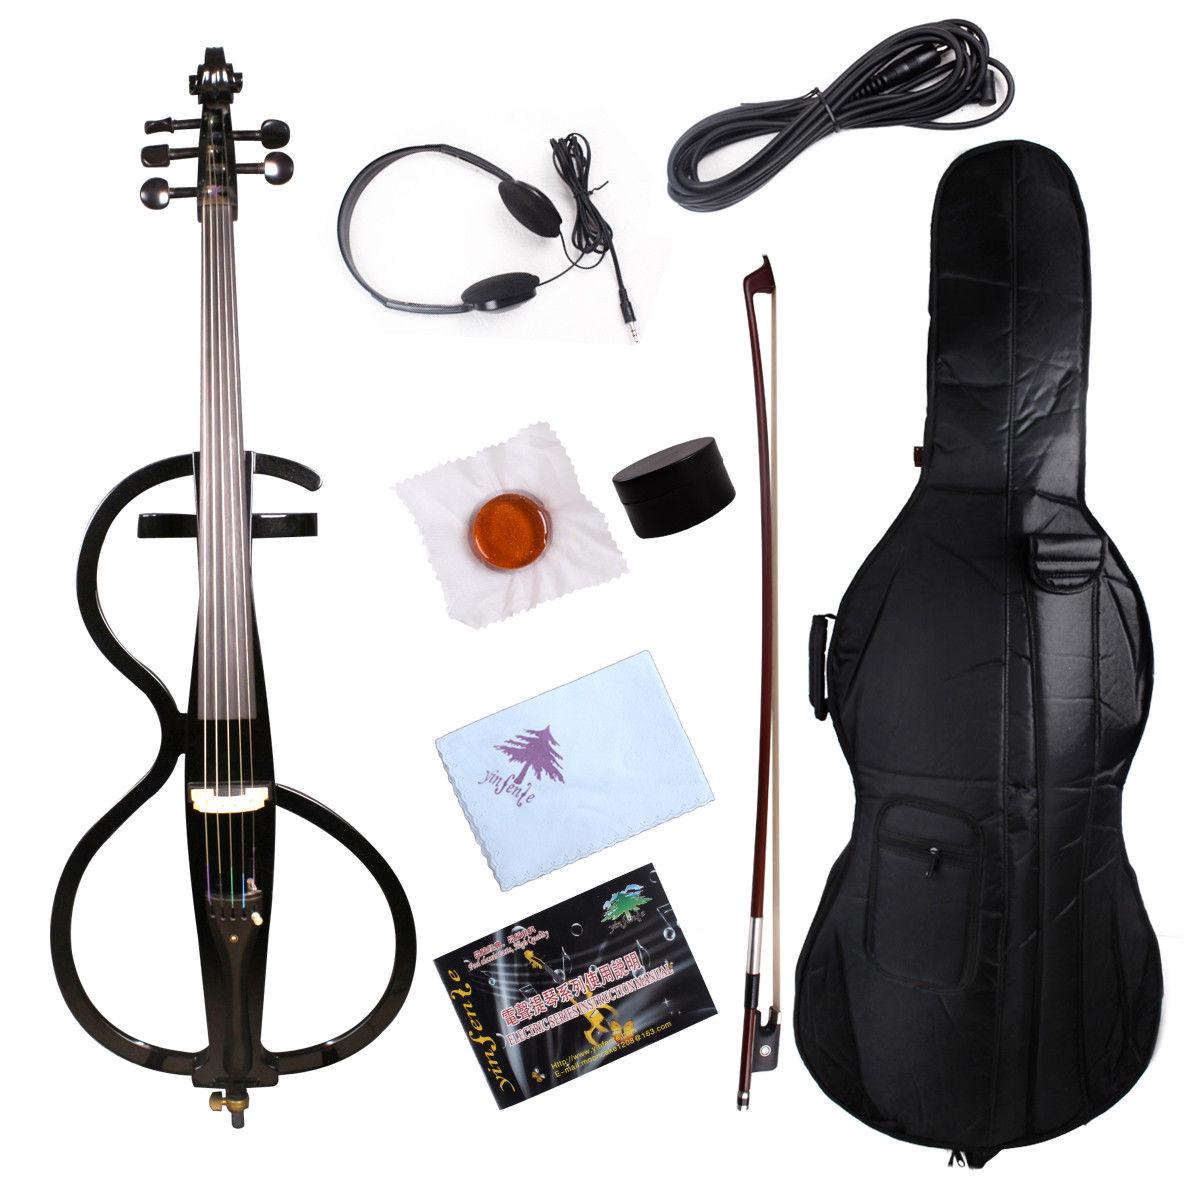 Yinfente-violonchelo eléctrico, 5 cuerdas, 4/4 negro, madera maciza, bolsa de sonido dulce,...